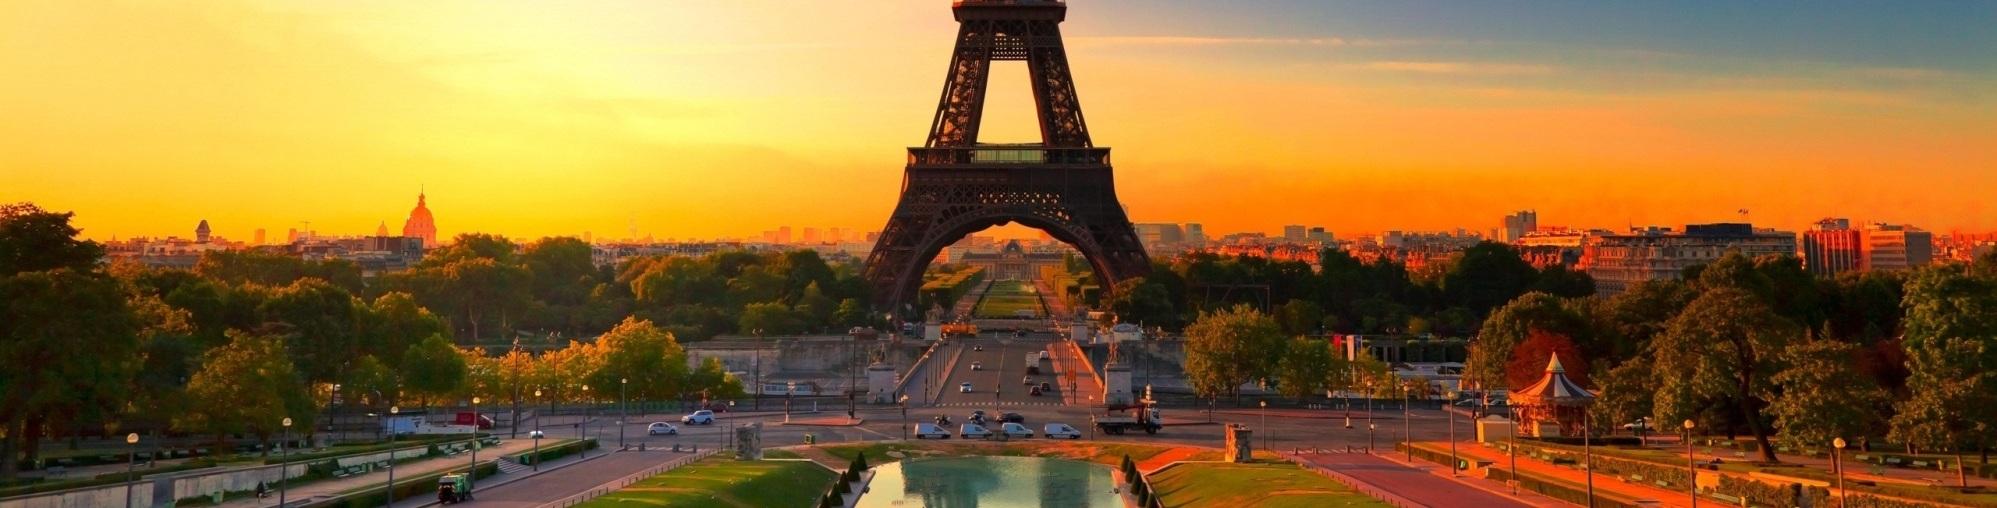 PARIZ PRVI MAJ I USKRS